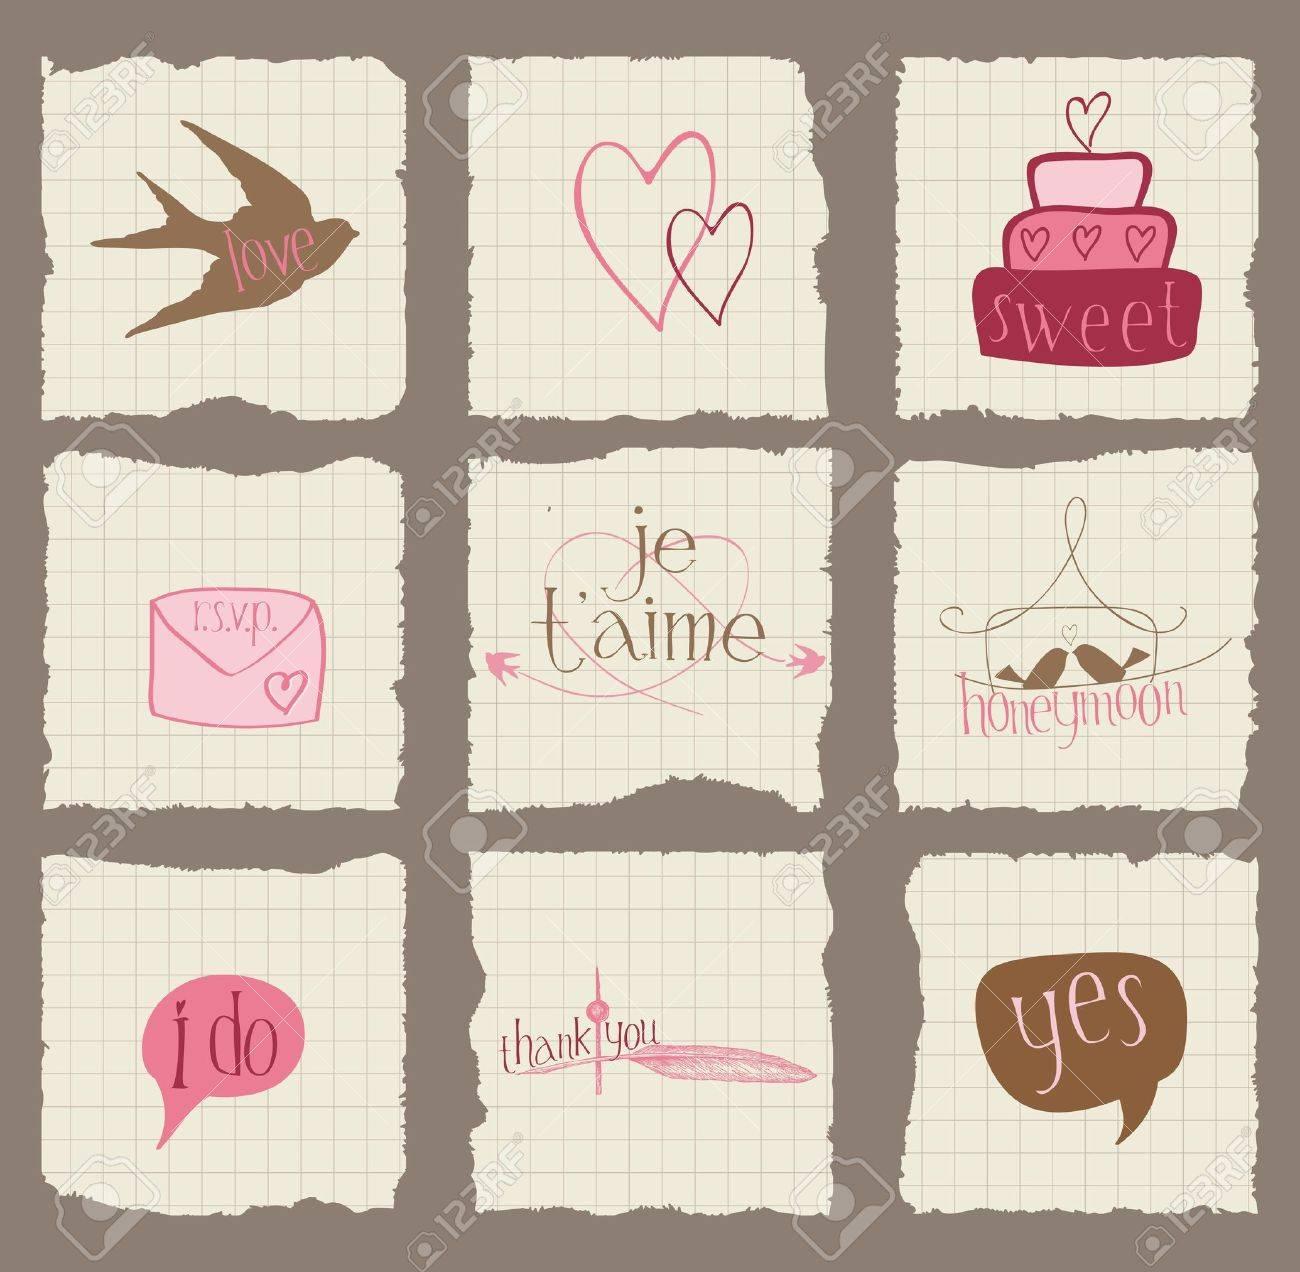 12x12 wedding scrapbook paper - Paper Love And Wedding Design Elements For Invitation Scrapbook Paper Love And Wedding Design Elements For